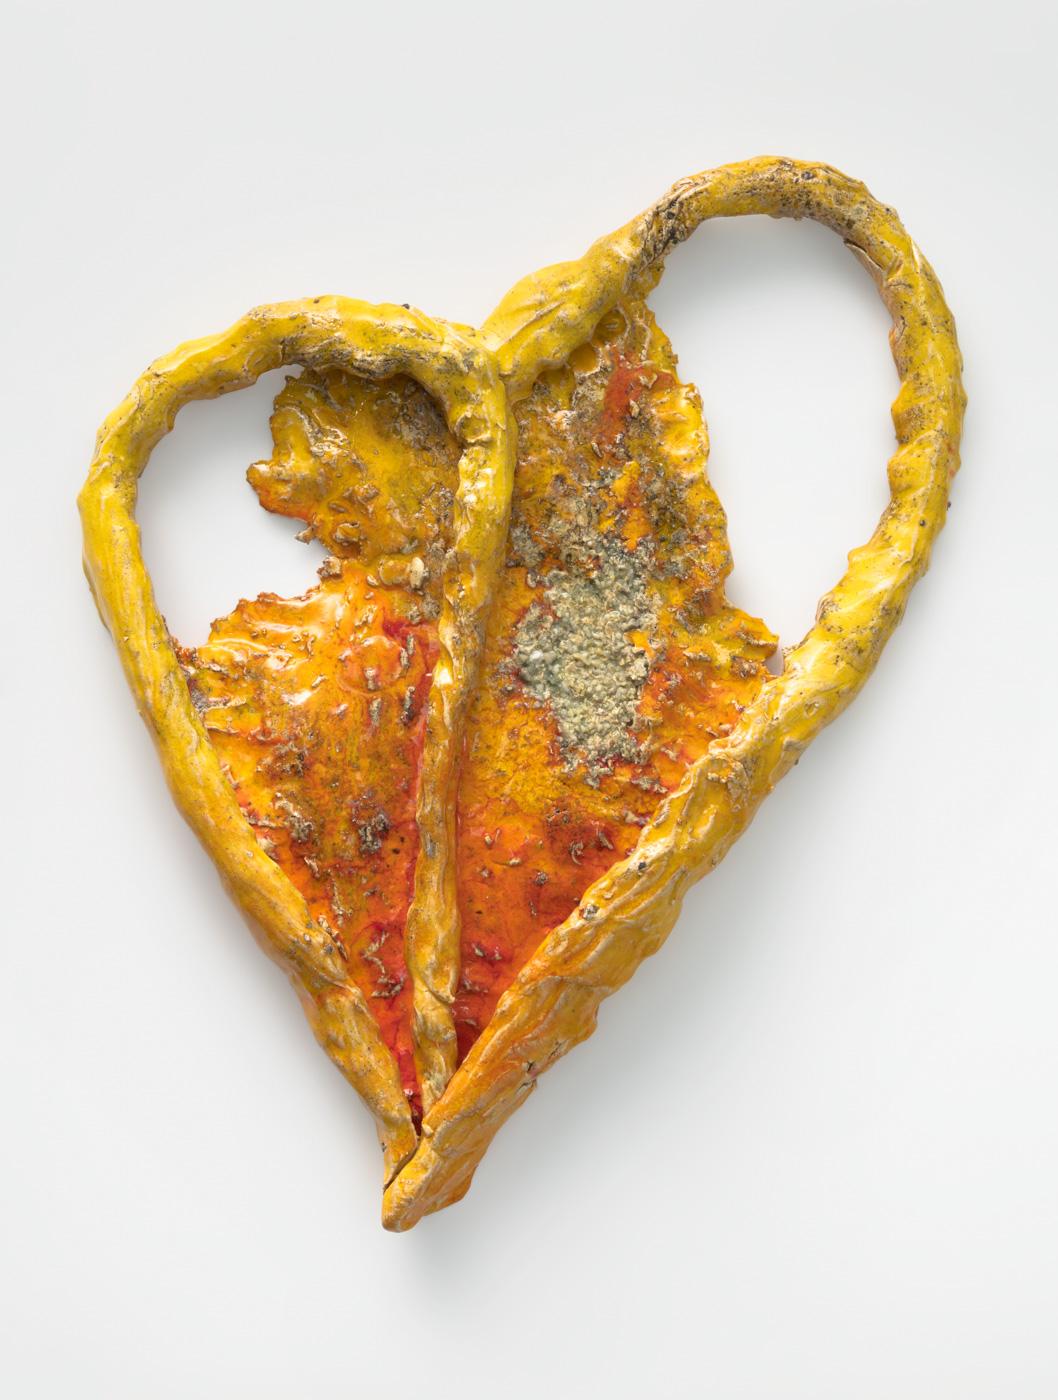 HEART (6638), 2018